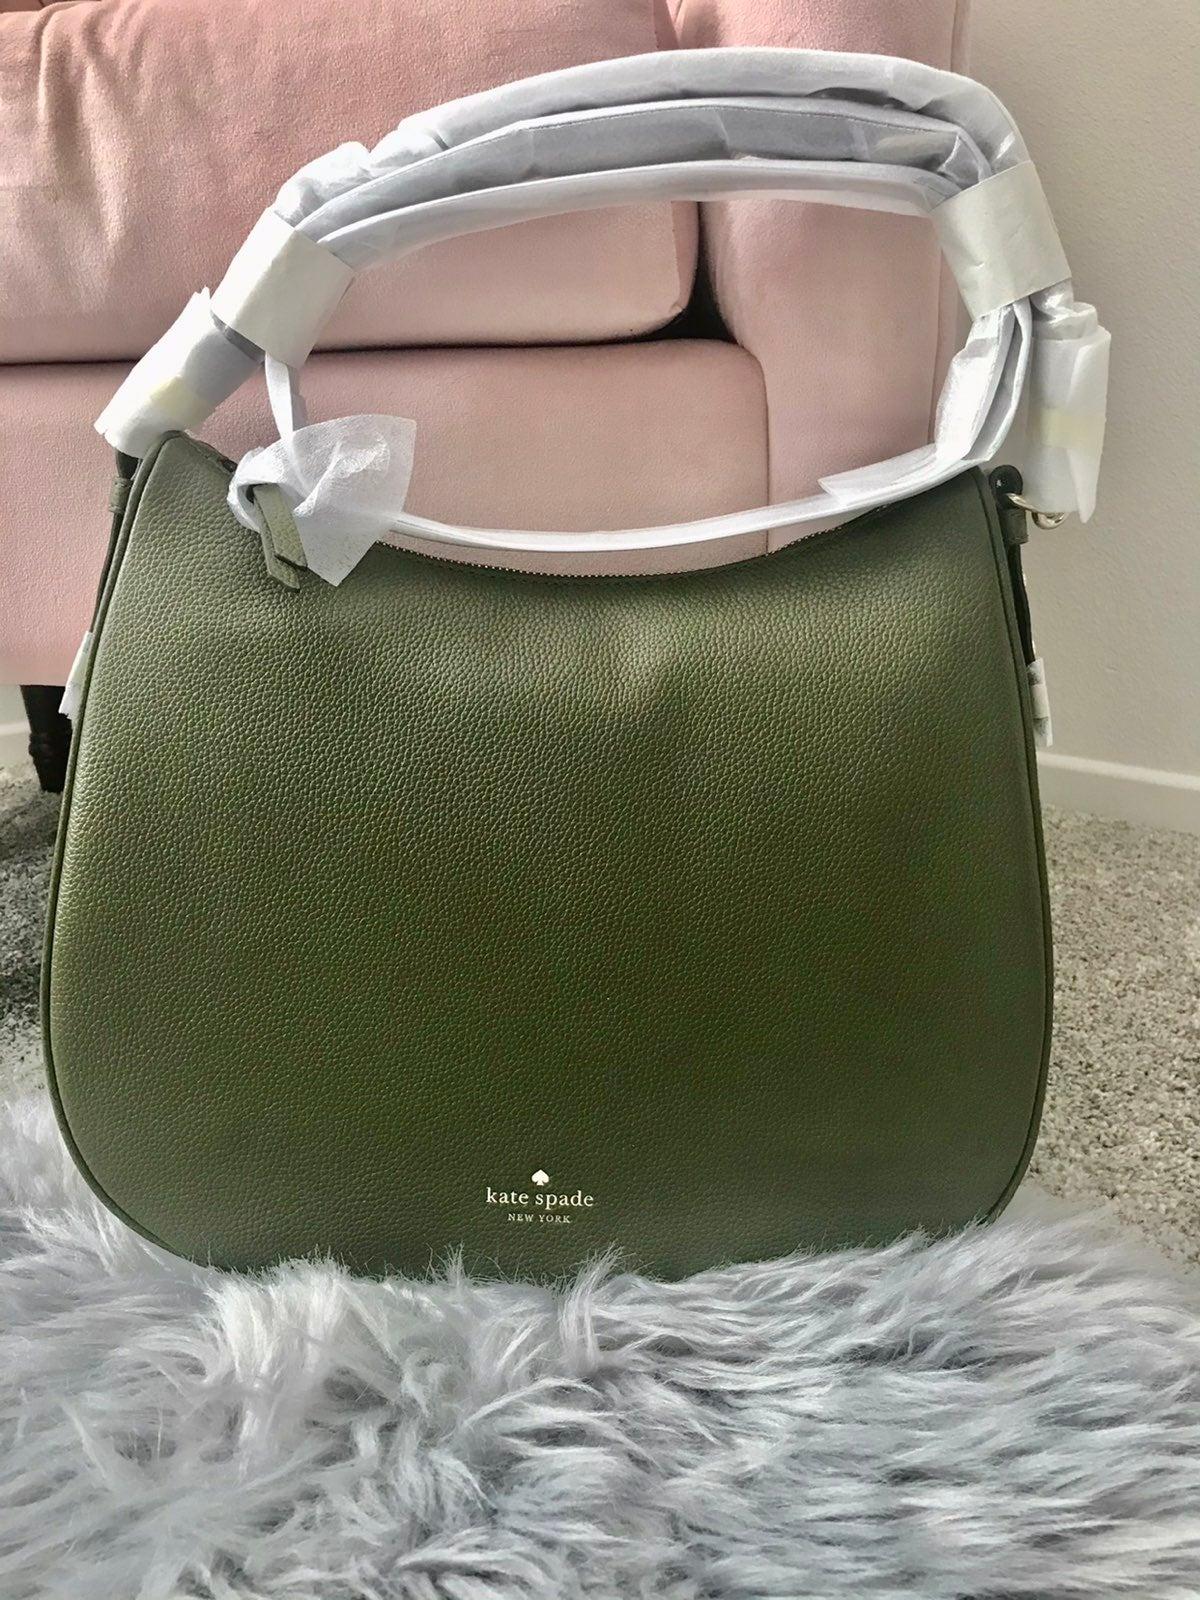 Kate Spade vivian purse